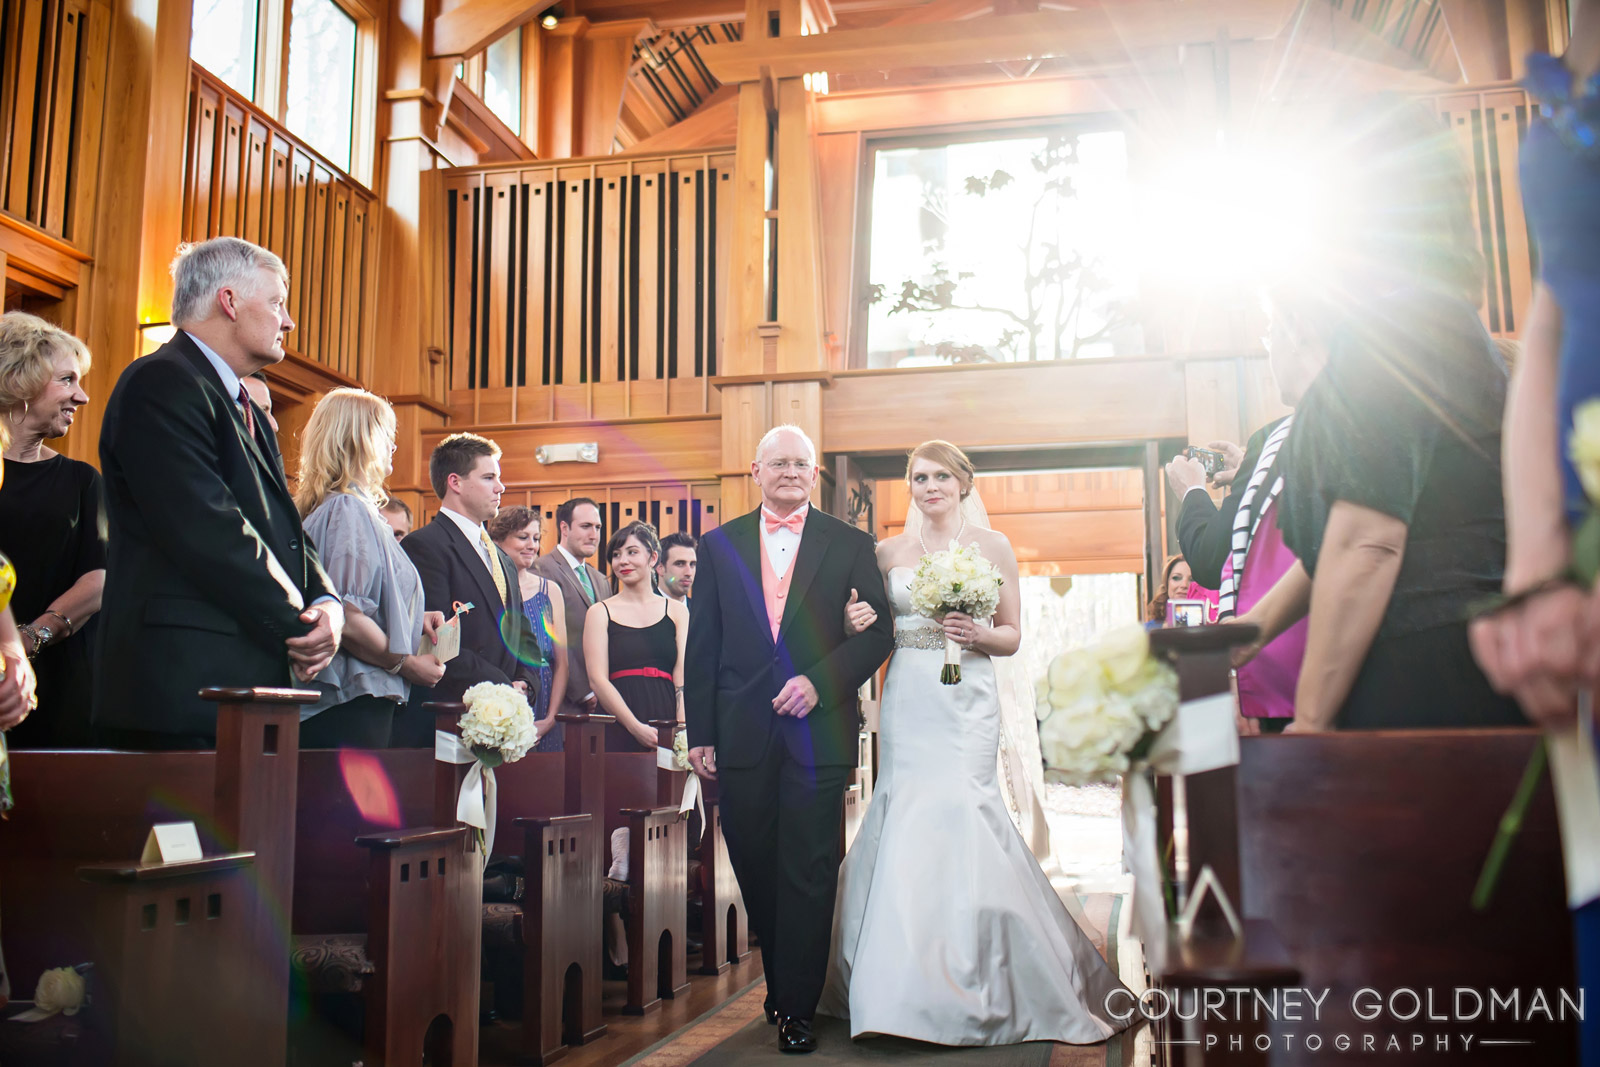 Atlanta-Wedding-Photography-by-Courtney-Goldman-04.jpg